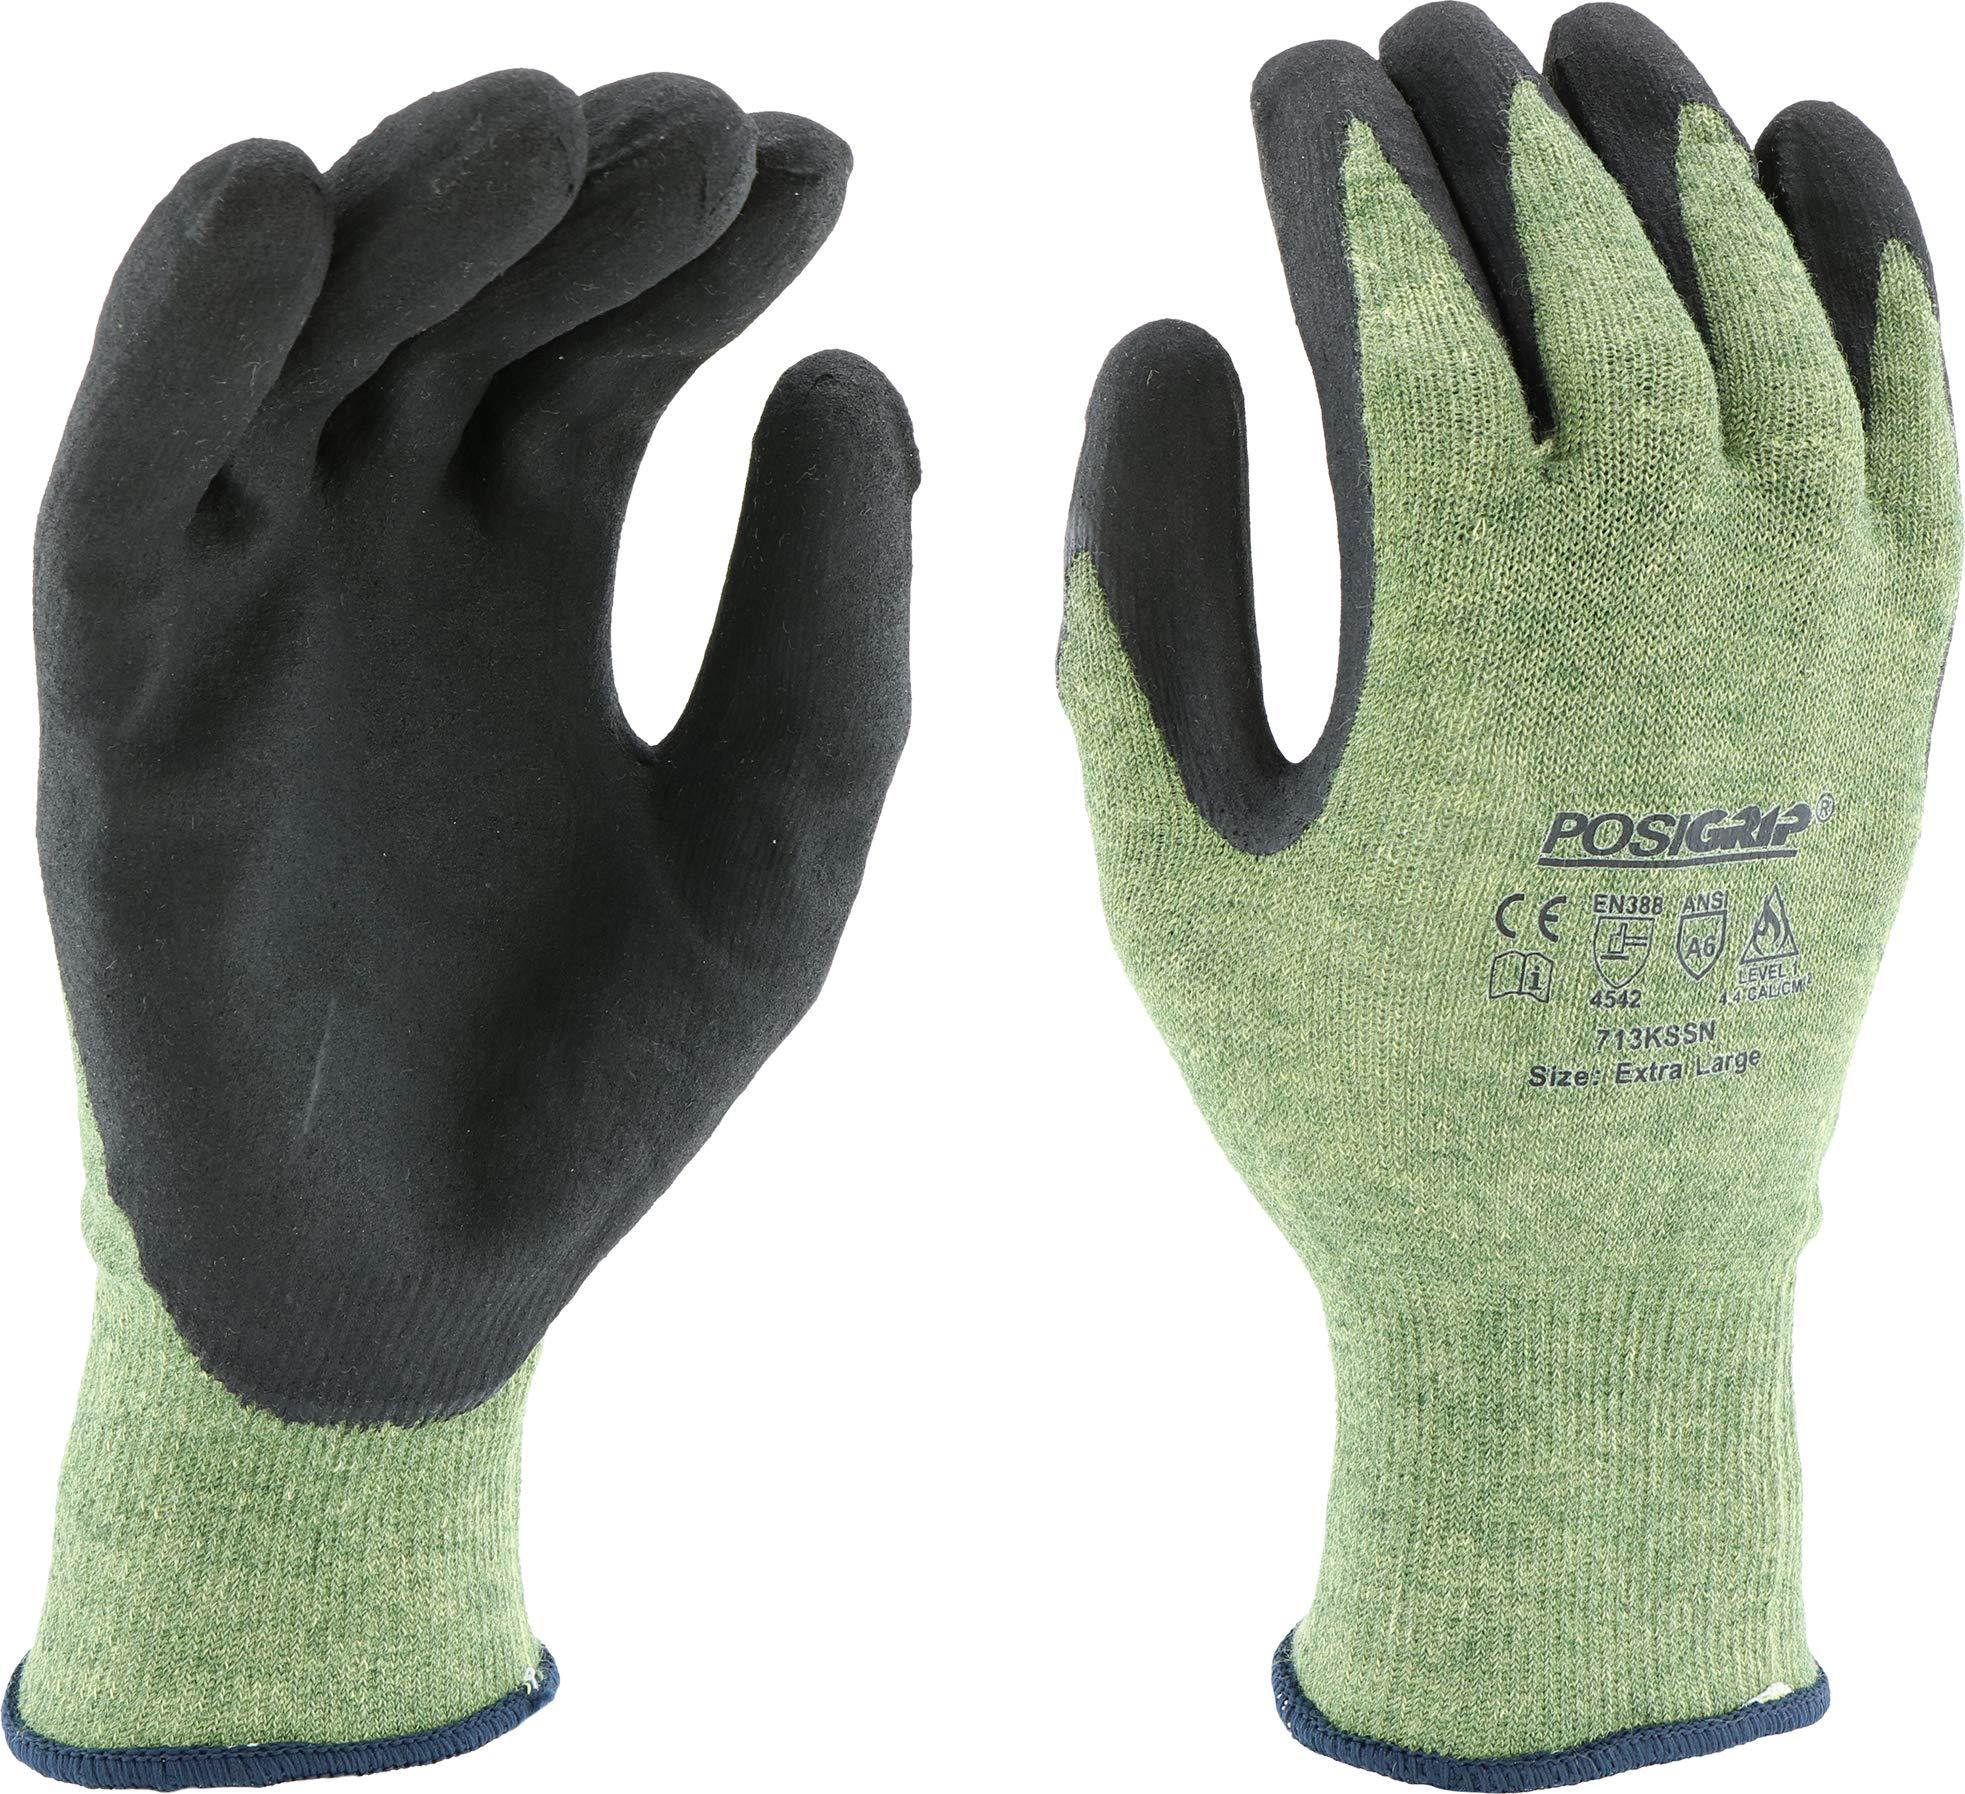 West Chester 713KSSN/XL 13 Gauge Green Kevlar/Steel Shell W/Black Micro Foam Nitride Coating. Antibacterial/Dmf Free Dozen